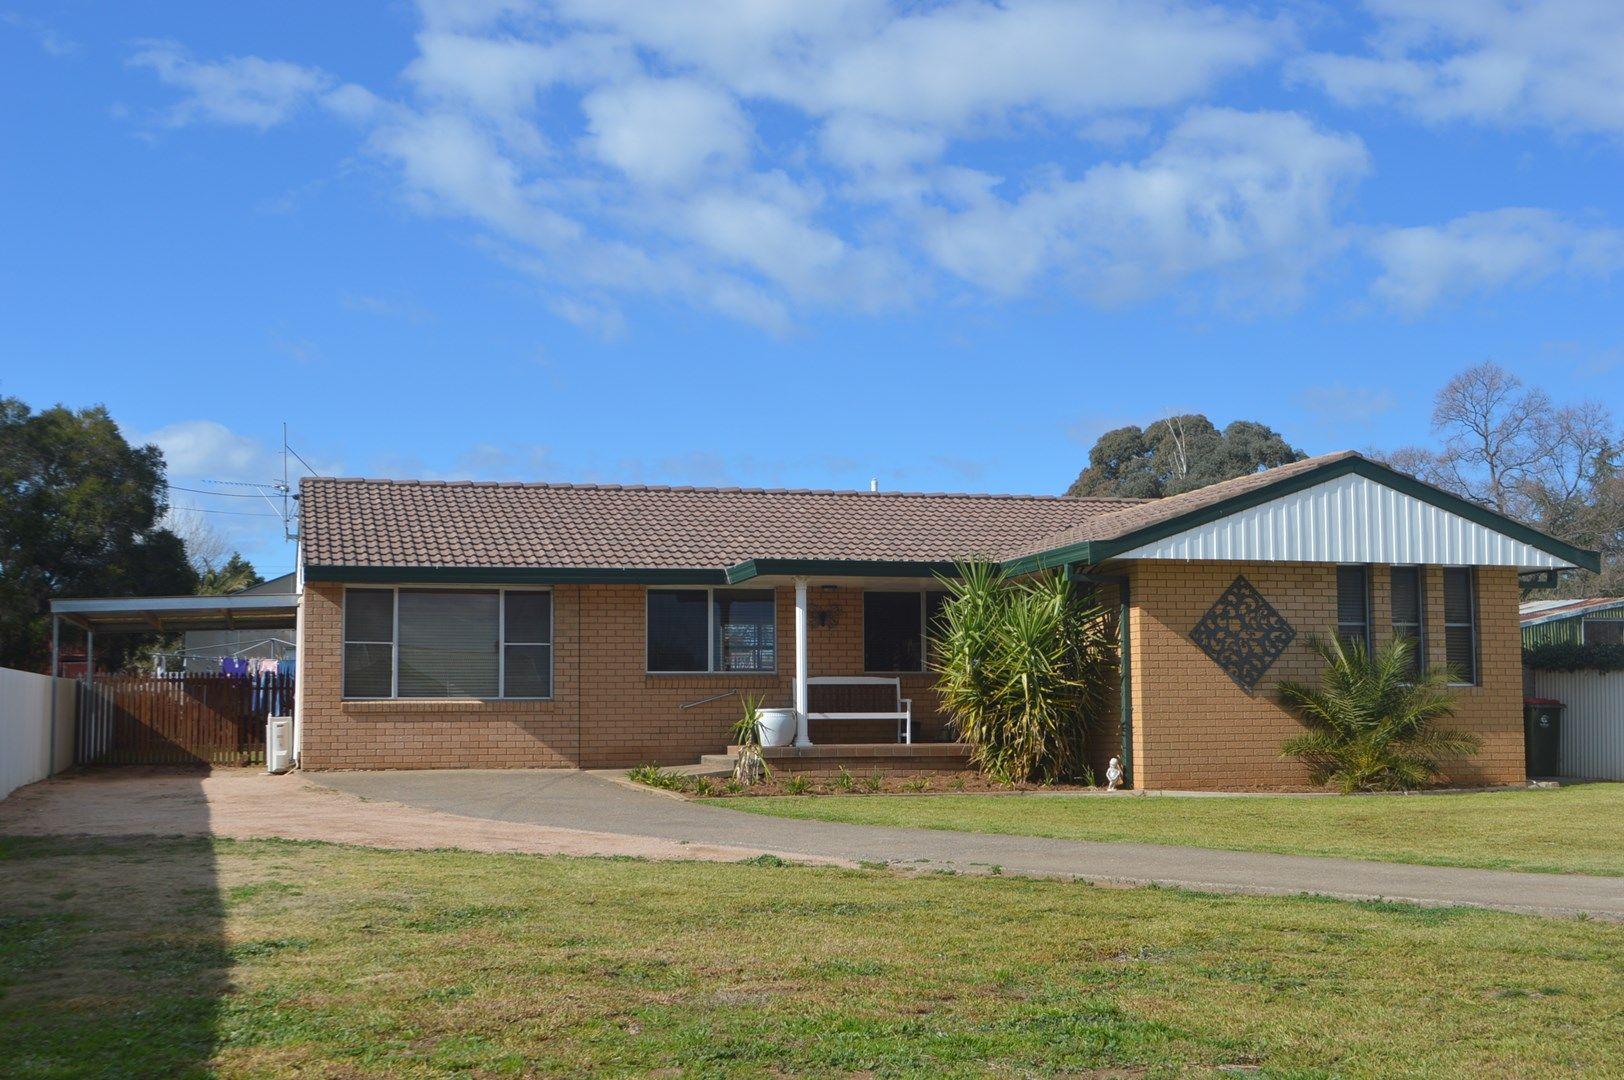 14 Waddell Street, Canowindra NSW 2804, Image 0